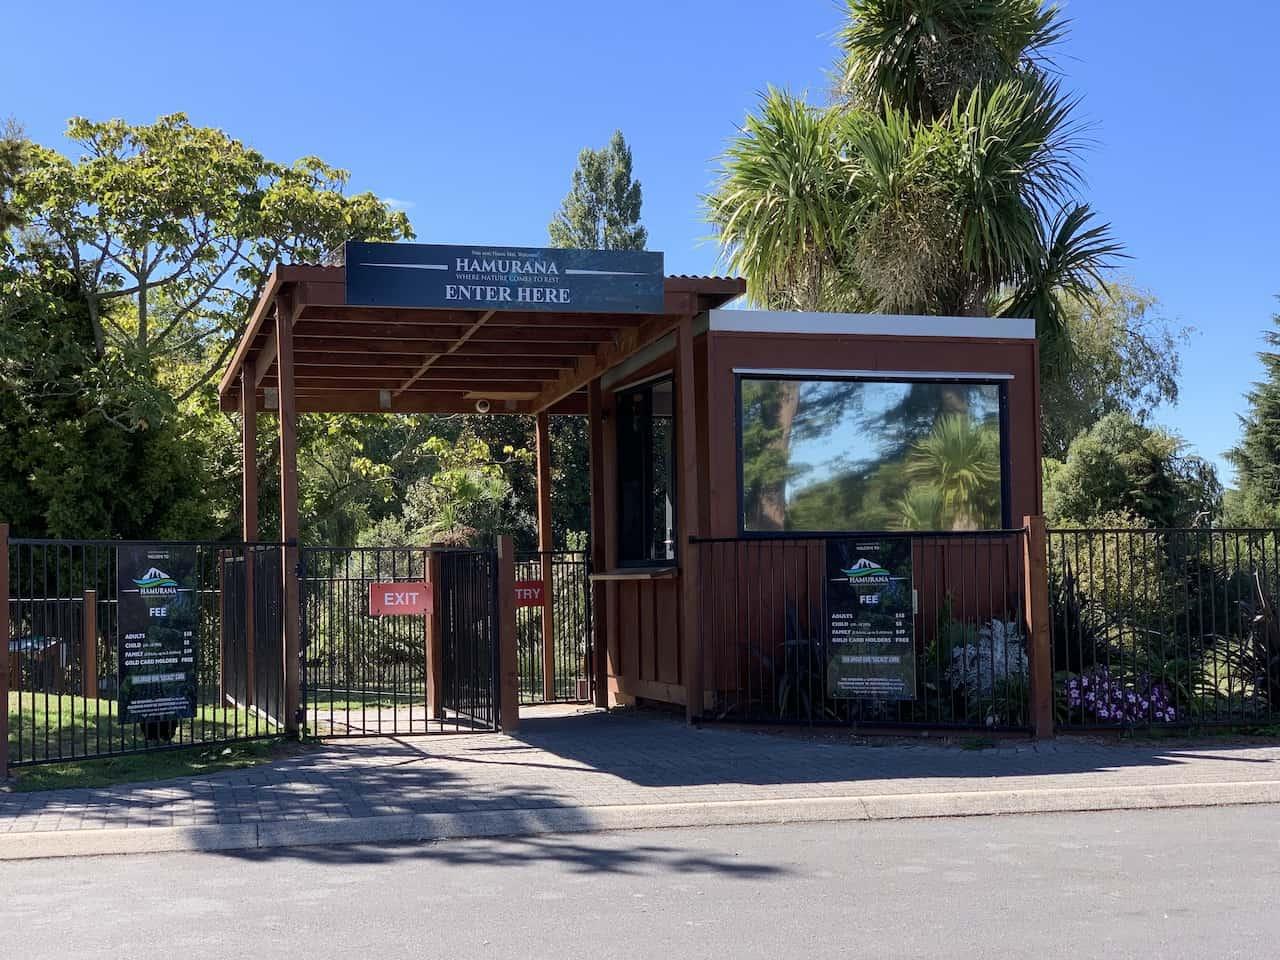 Hamurana Springs Entrance